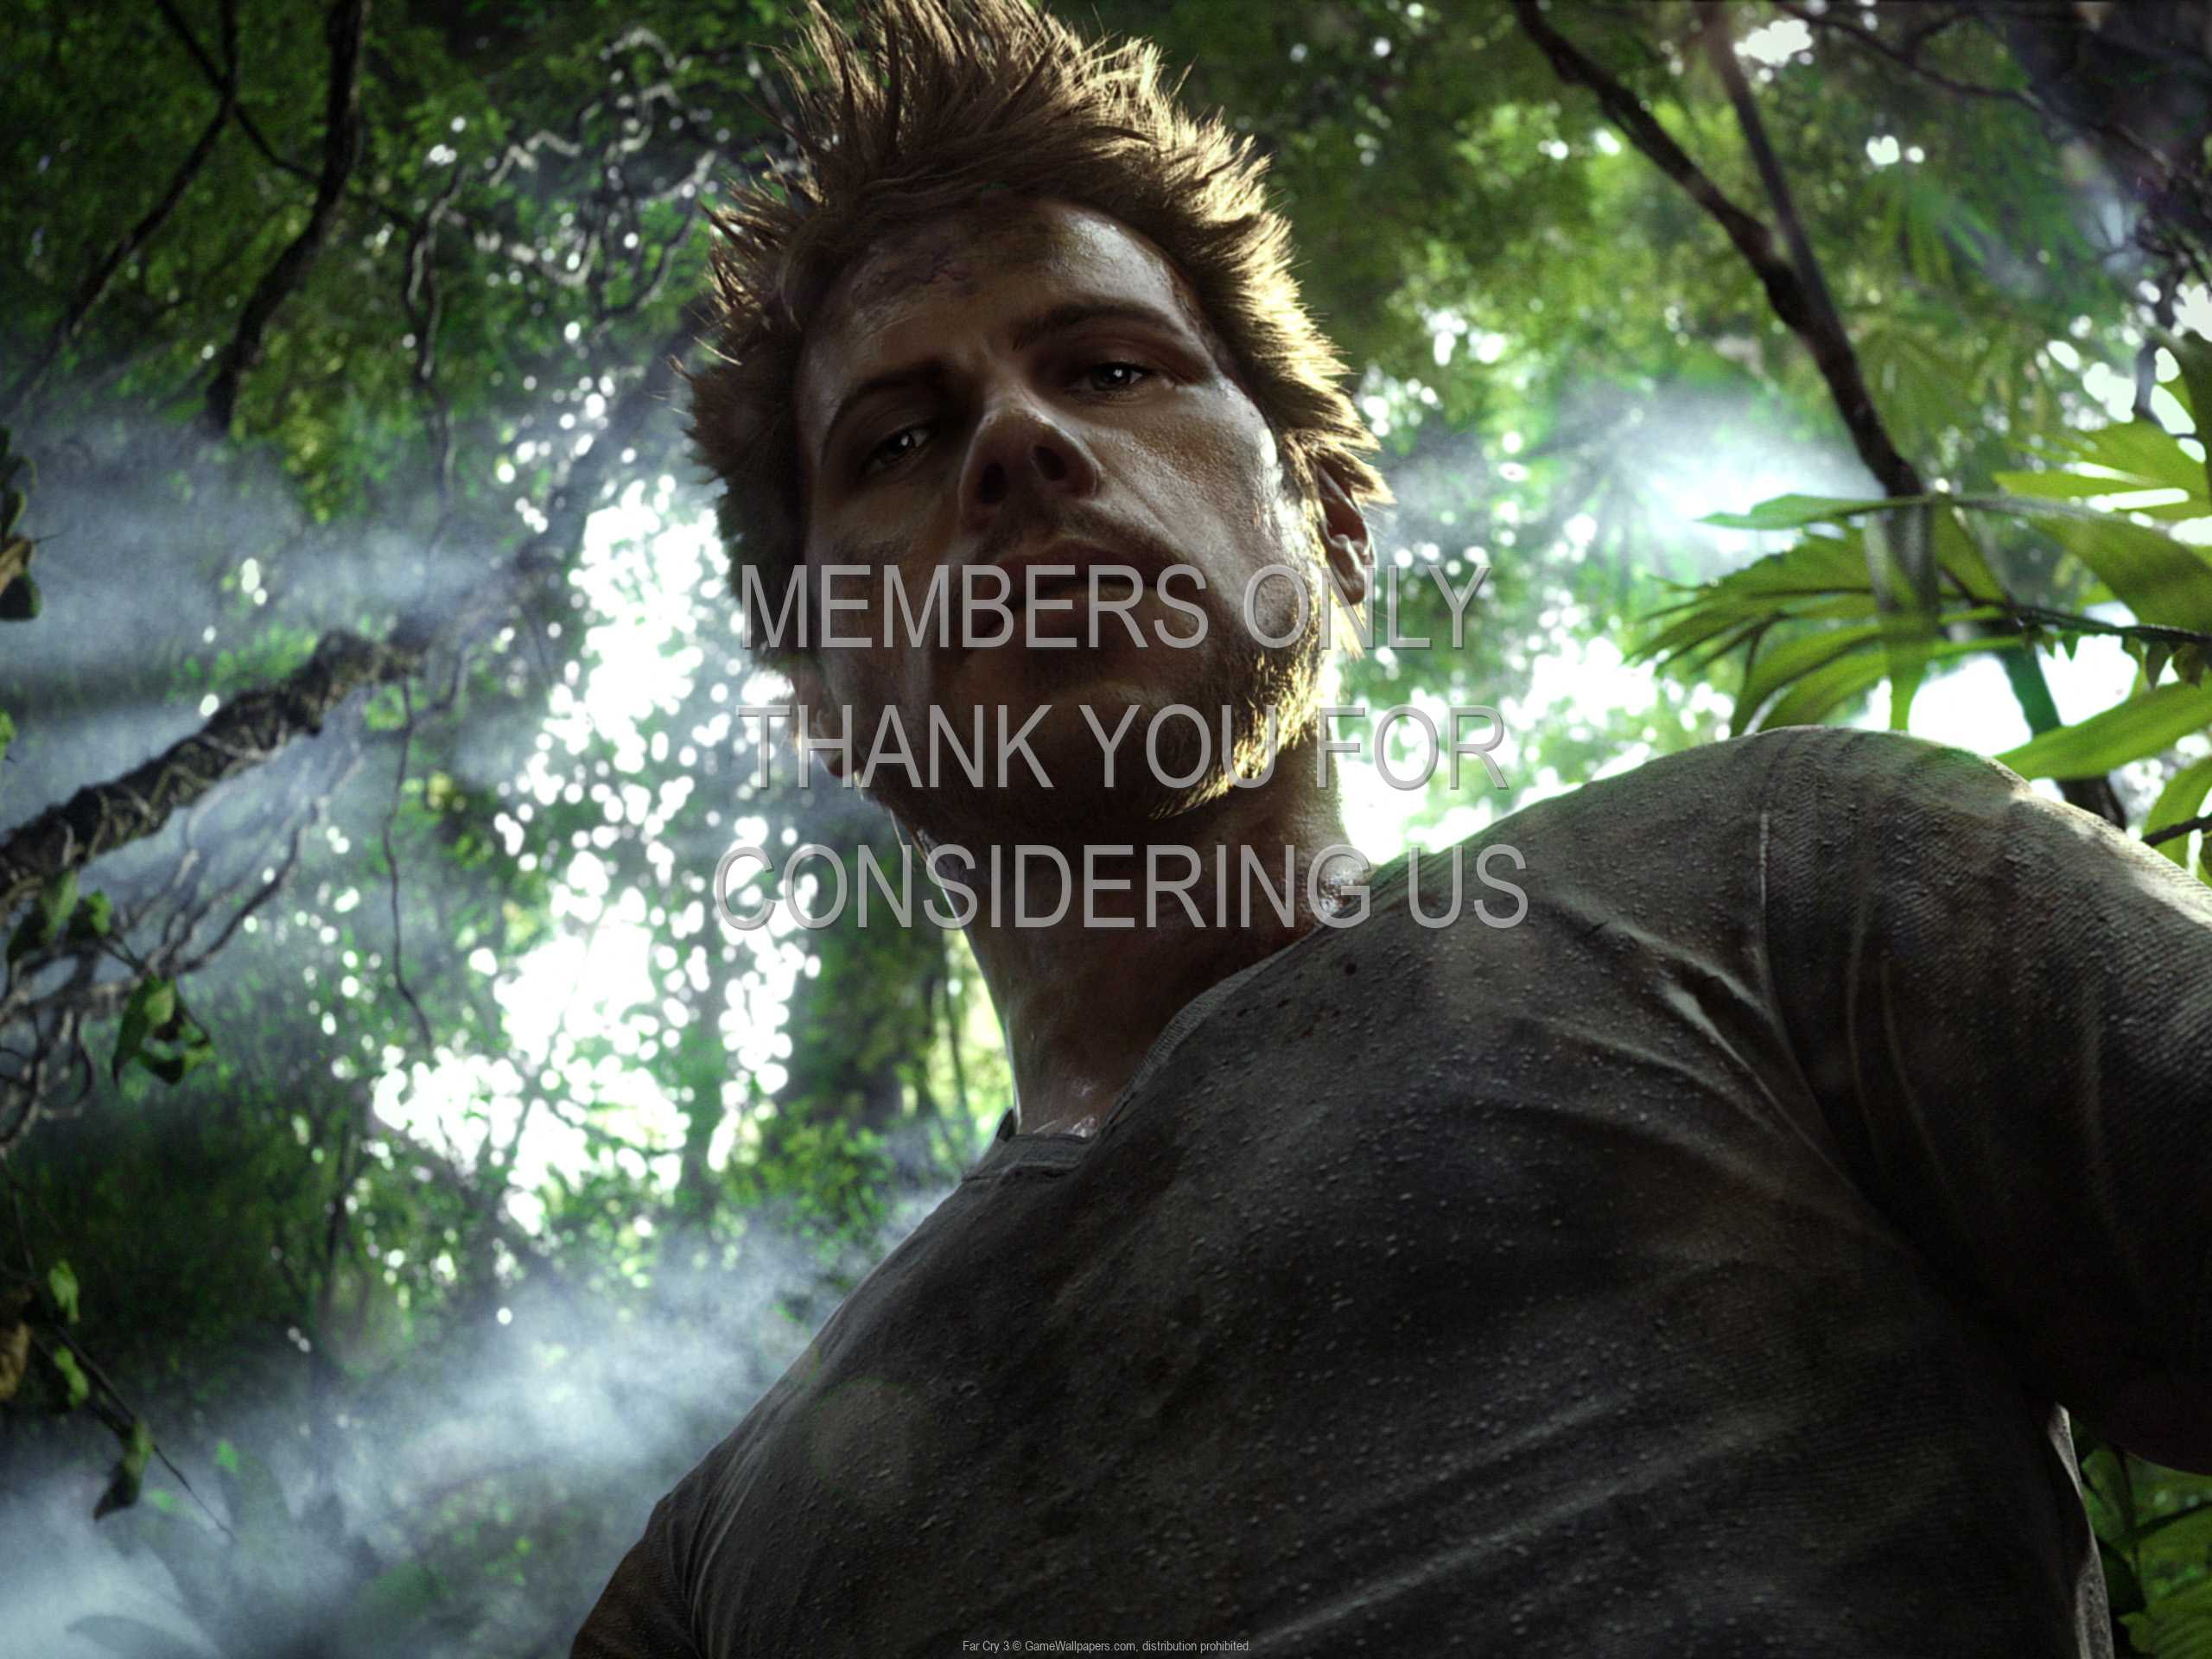 Far Cry 3 Wallpaper 02 1080p Horizontal